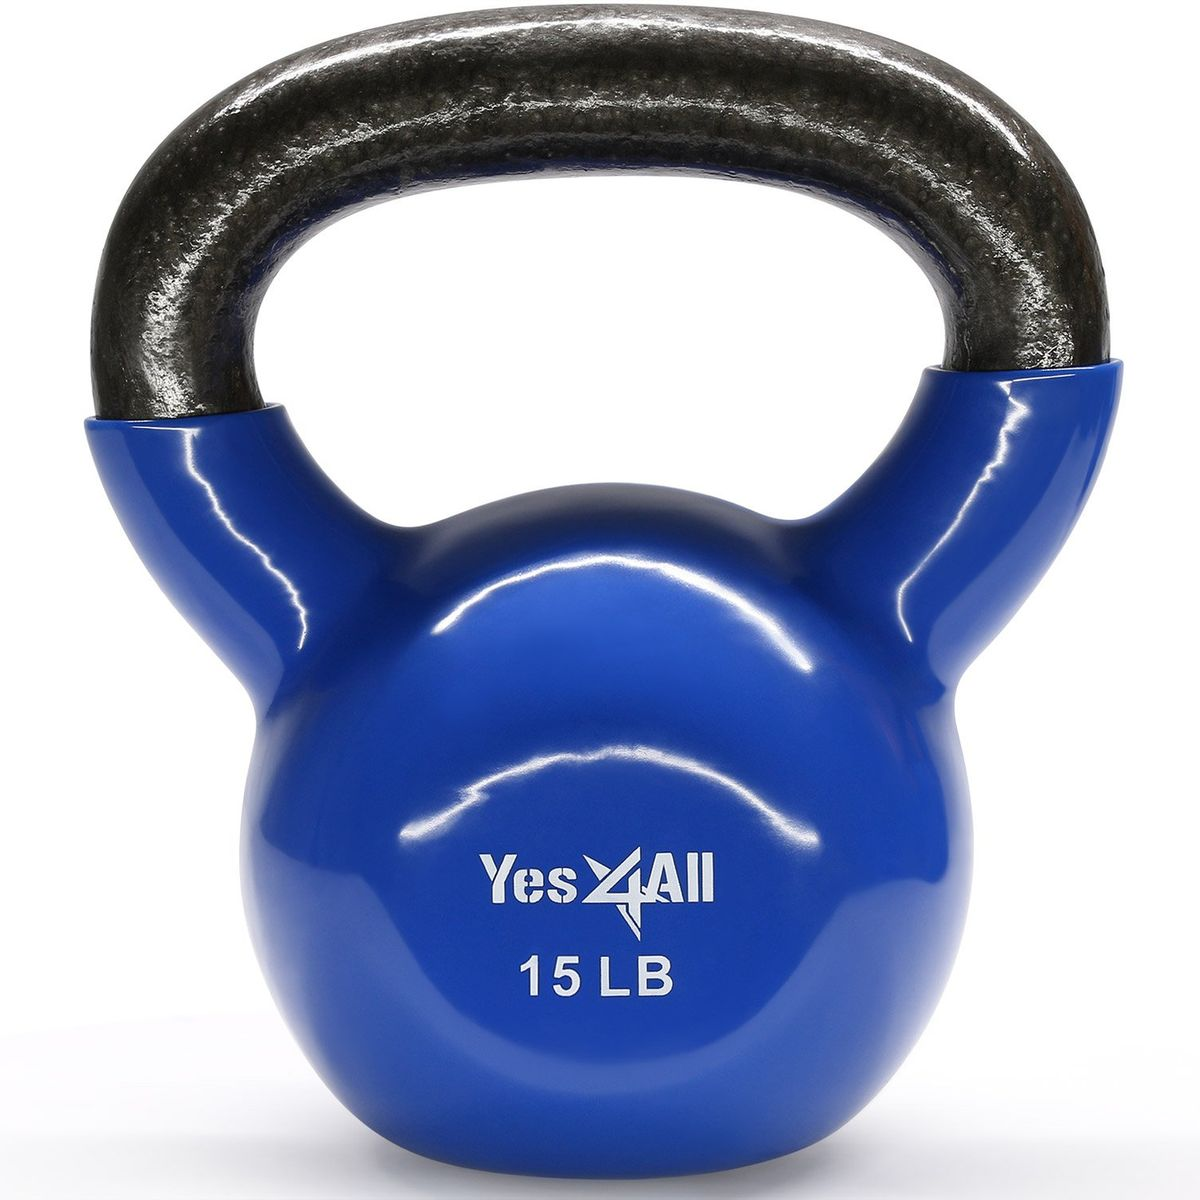 KLDJHNS Strength Training Kettlebells Kettle Bell 10 15 20 25 30 35 40 Lb Great Assistant for Home Office Fitness Adjustable Kettlebell are Suitable for Men and Women Strength Training